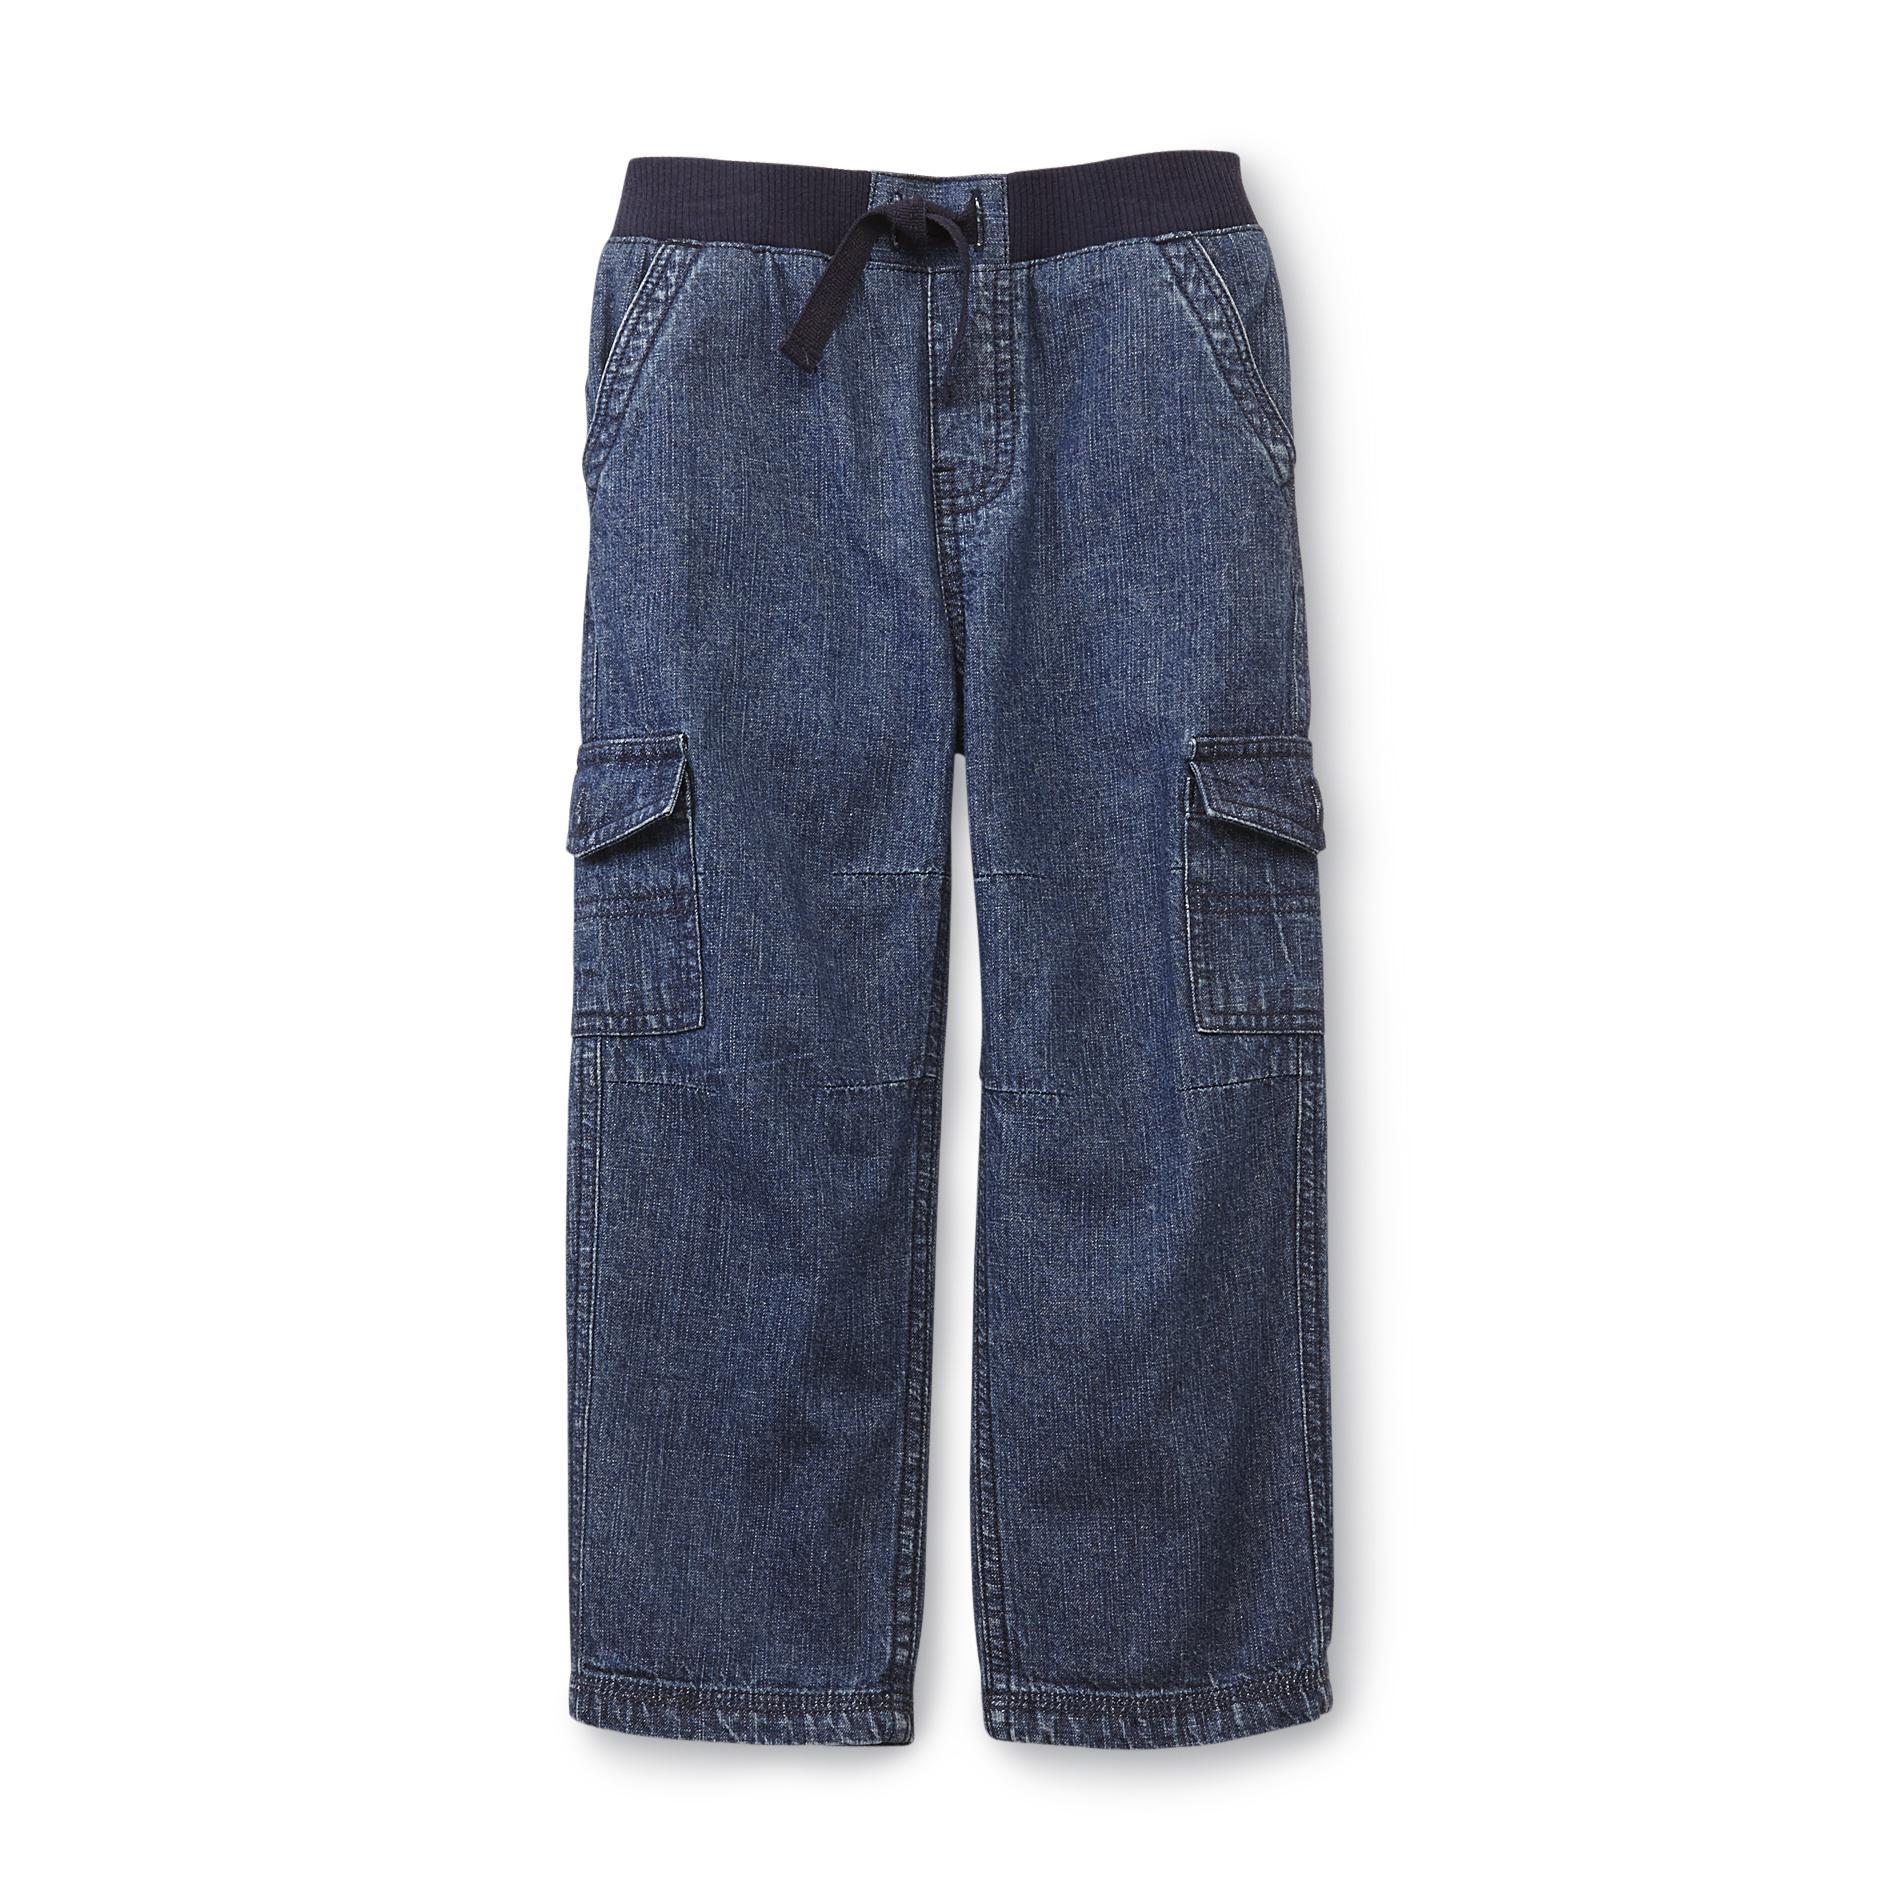 Toughskins Infant & Toddler Boy's Cargo Jeans